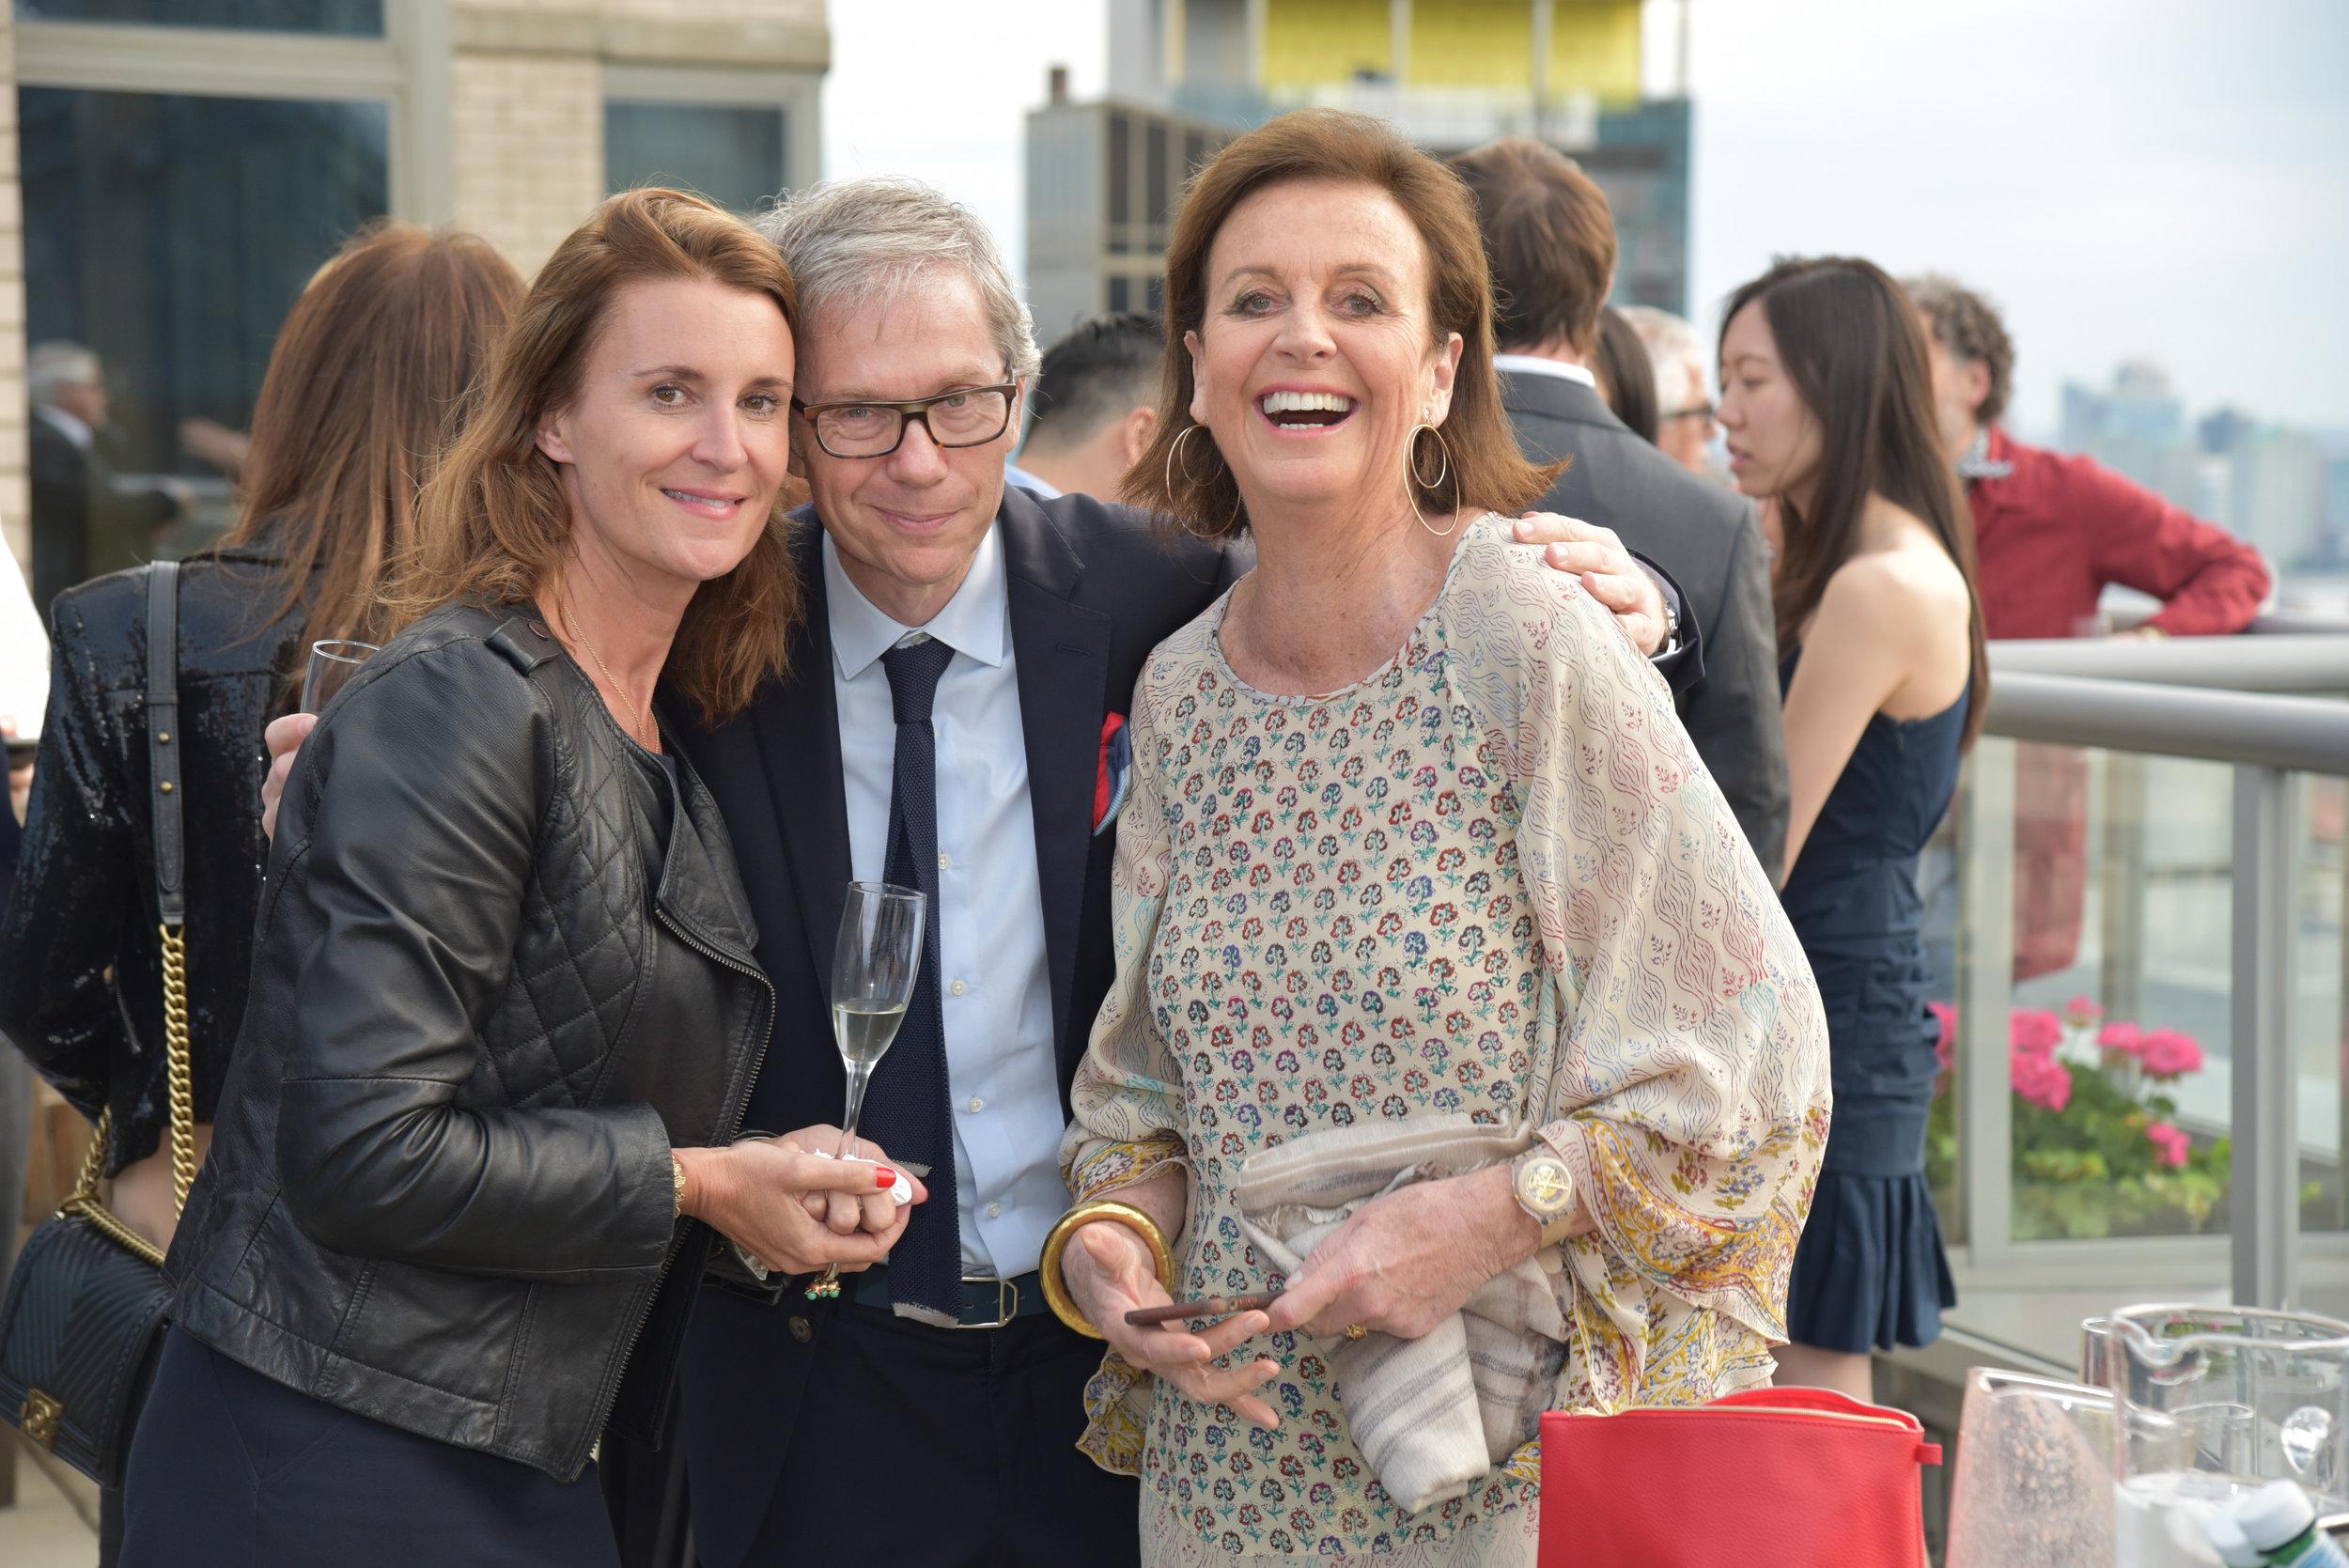 Emmanuelle Grelier, JC Agid, and Veronique Barbey.